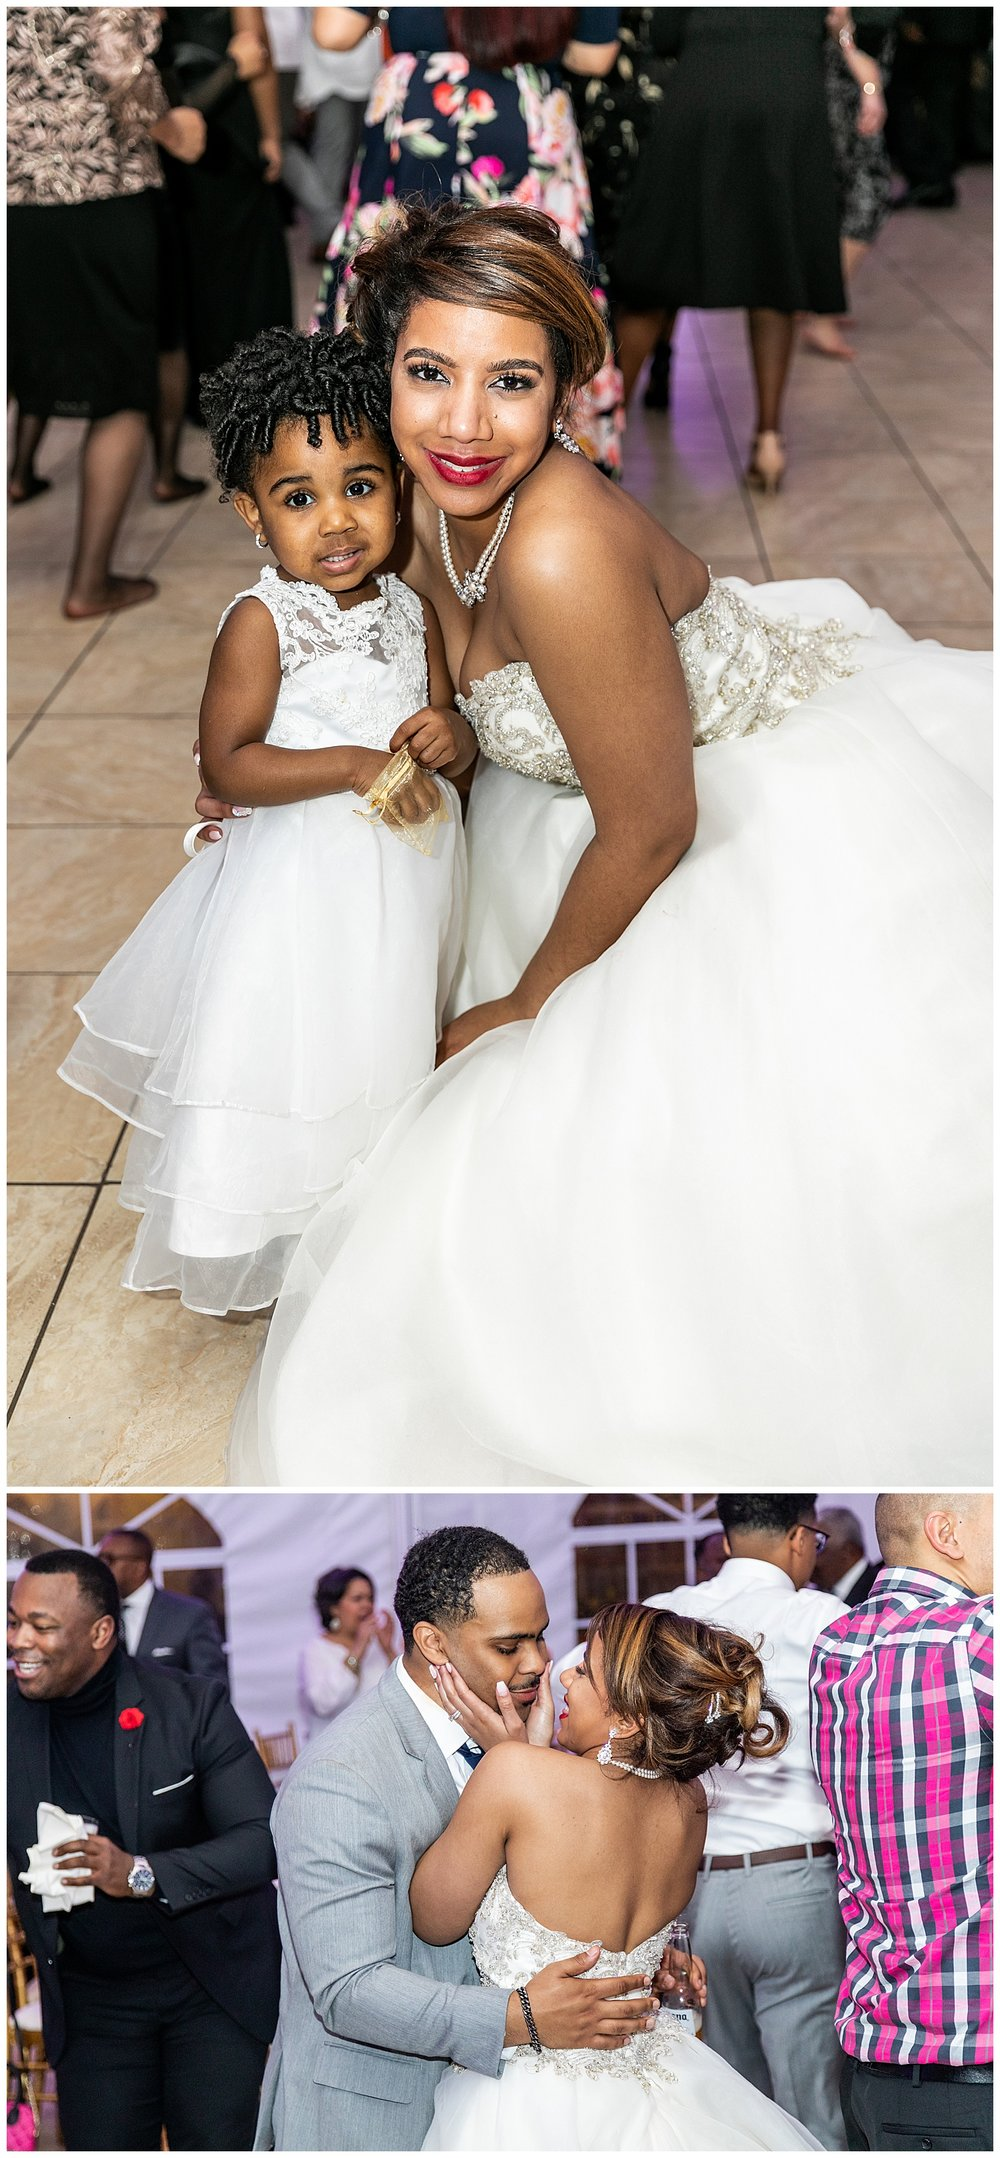 Brooke Nick Celebrations at the Bay Wedding Living Radiant Photography_0098.jpg